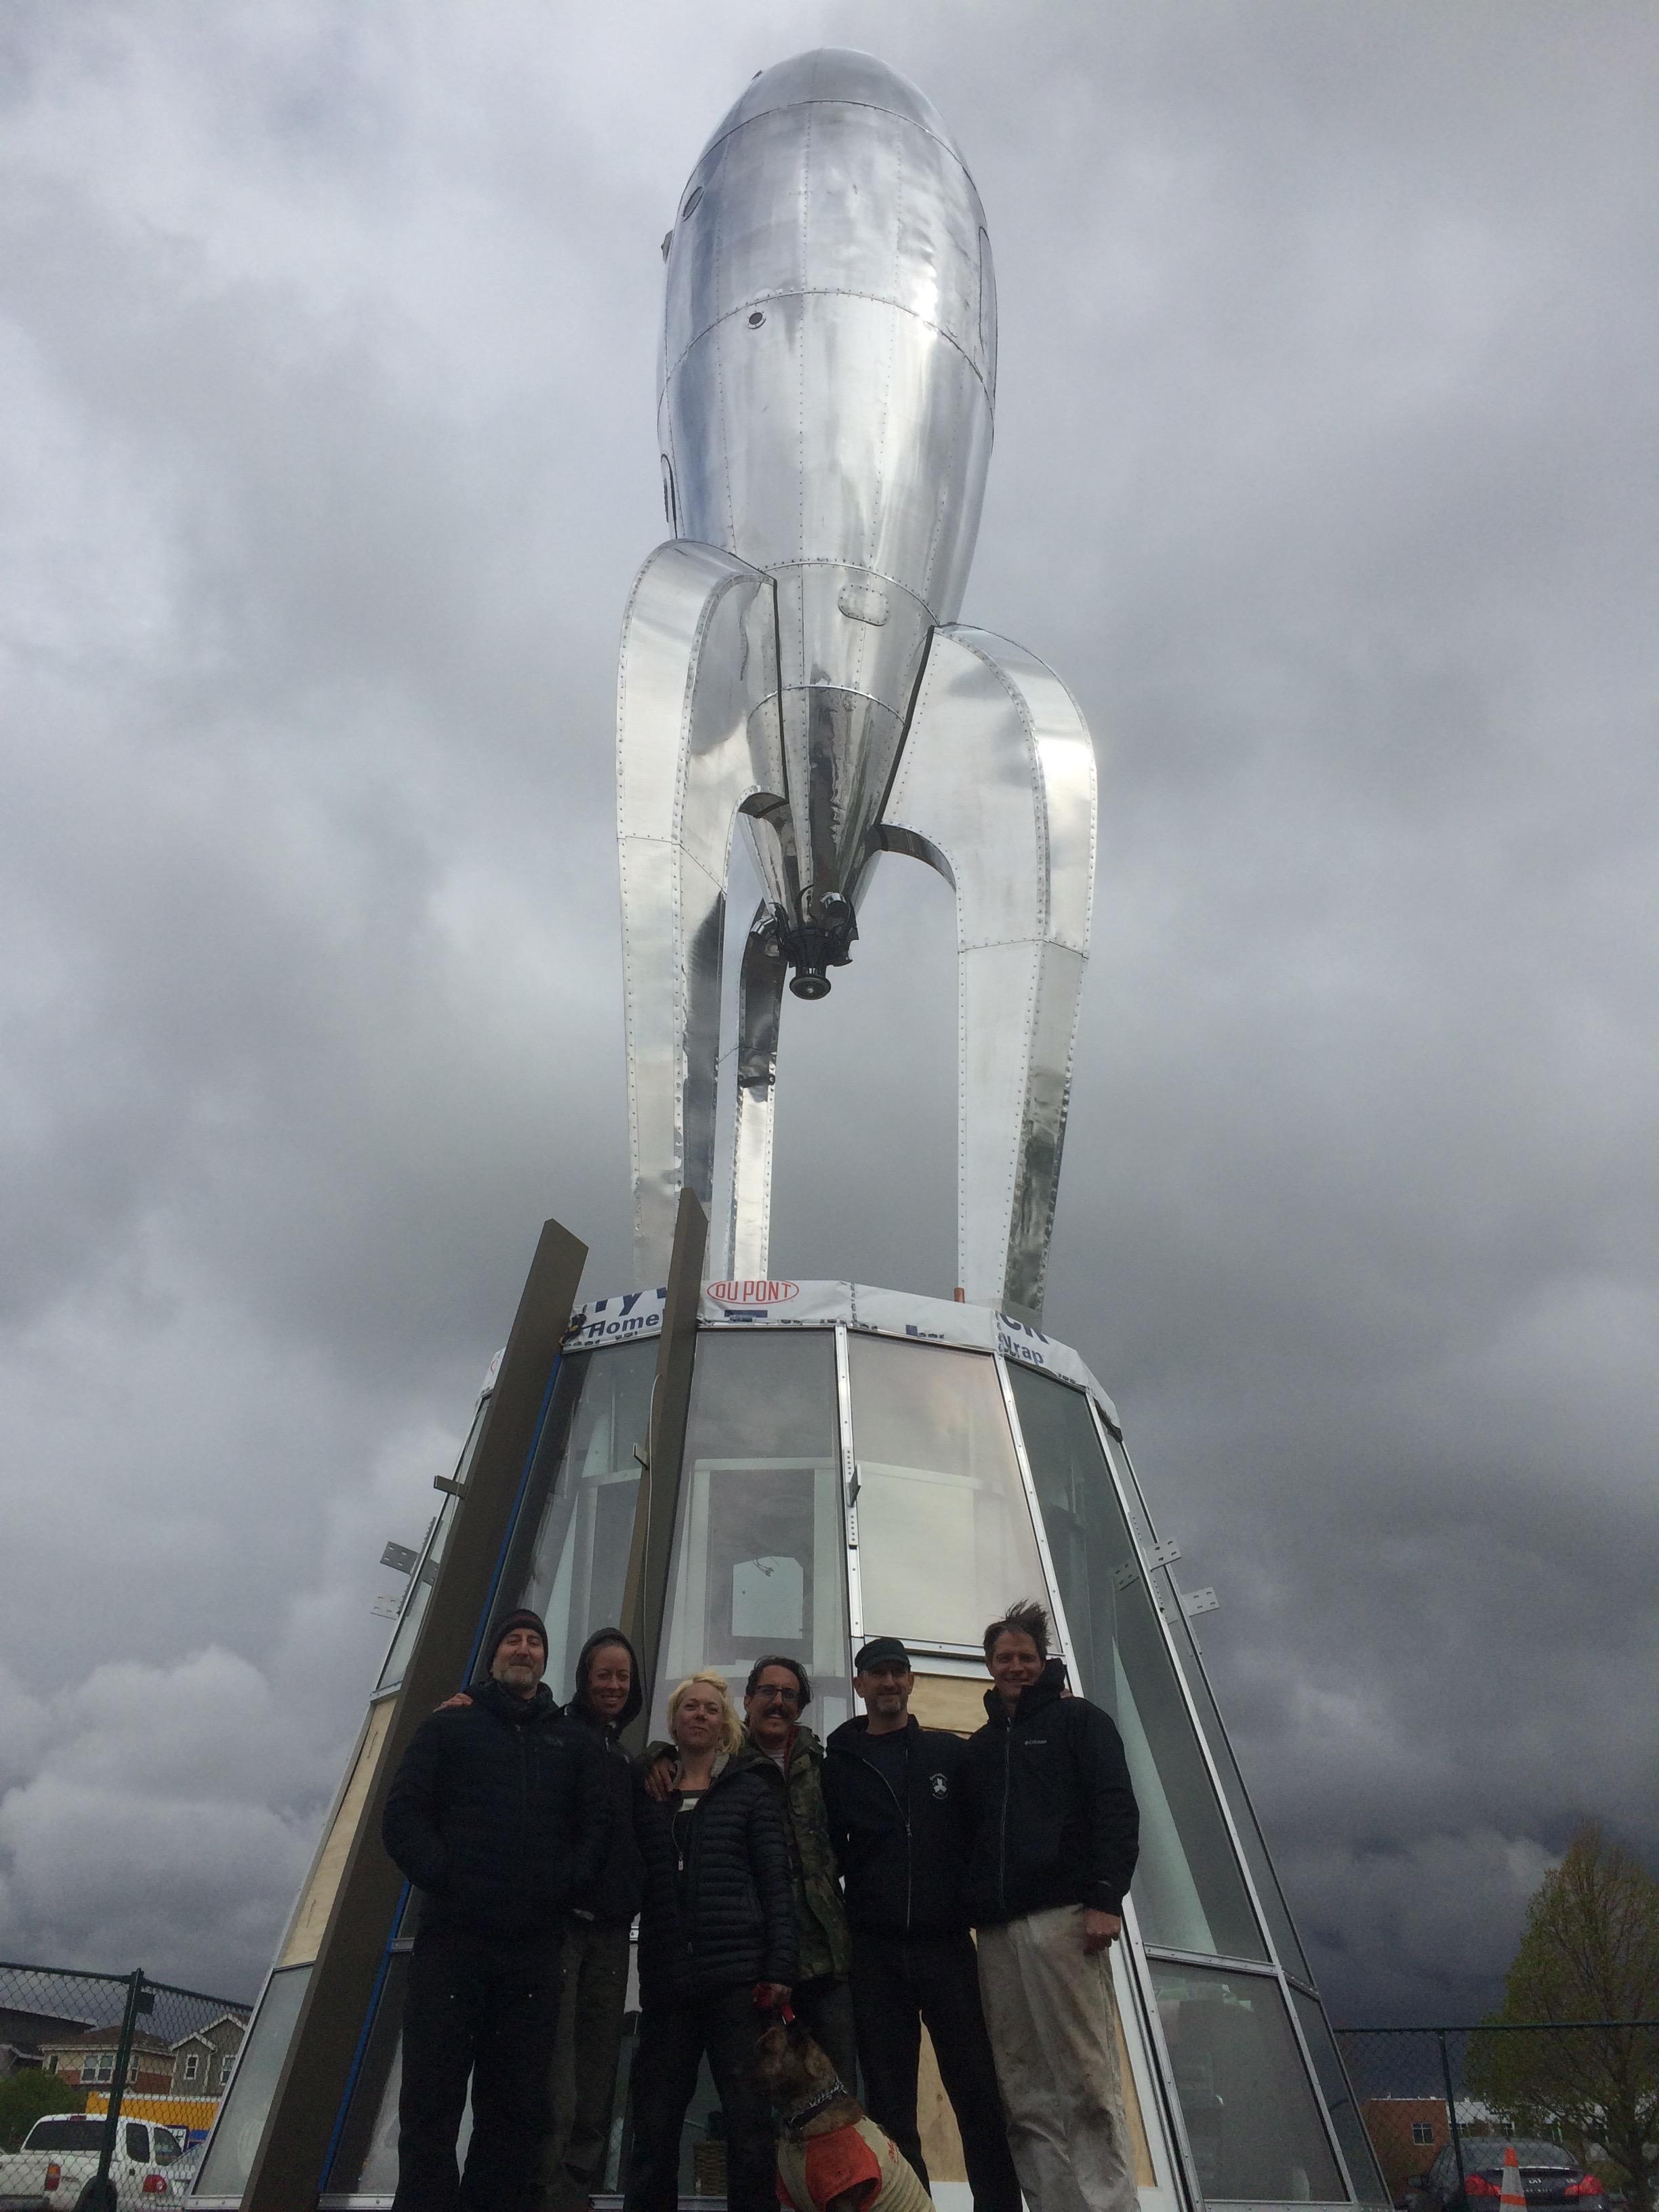 Raygun Gothic Rocketship permanently installed in Denver, CO.